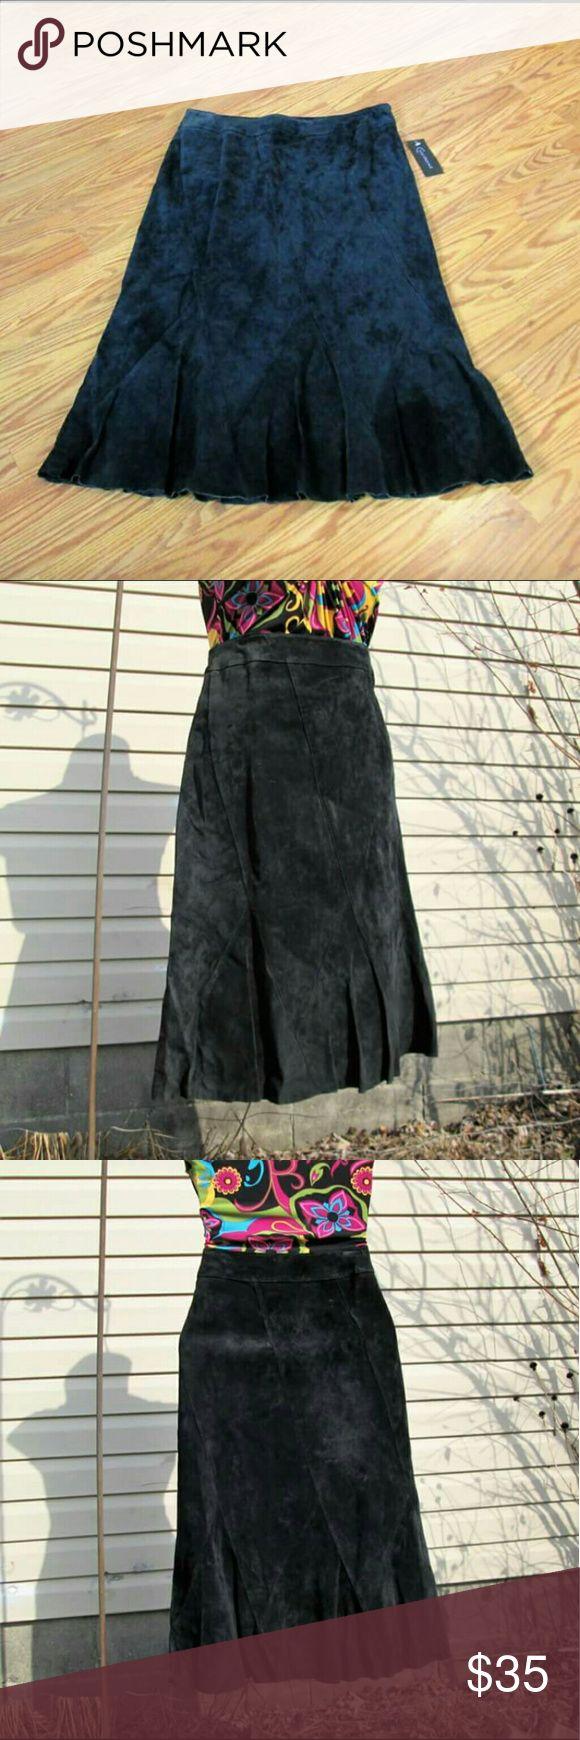 NWT 💎Suede Tulip Skirt Flirty lil kick hem. Triangle panel detailing. Fully lined. Side zip.  Measured flat. 16 1/2'' across waist. 31'' long.  feminine boho bohemian gypsy hippie festival Context Skirts